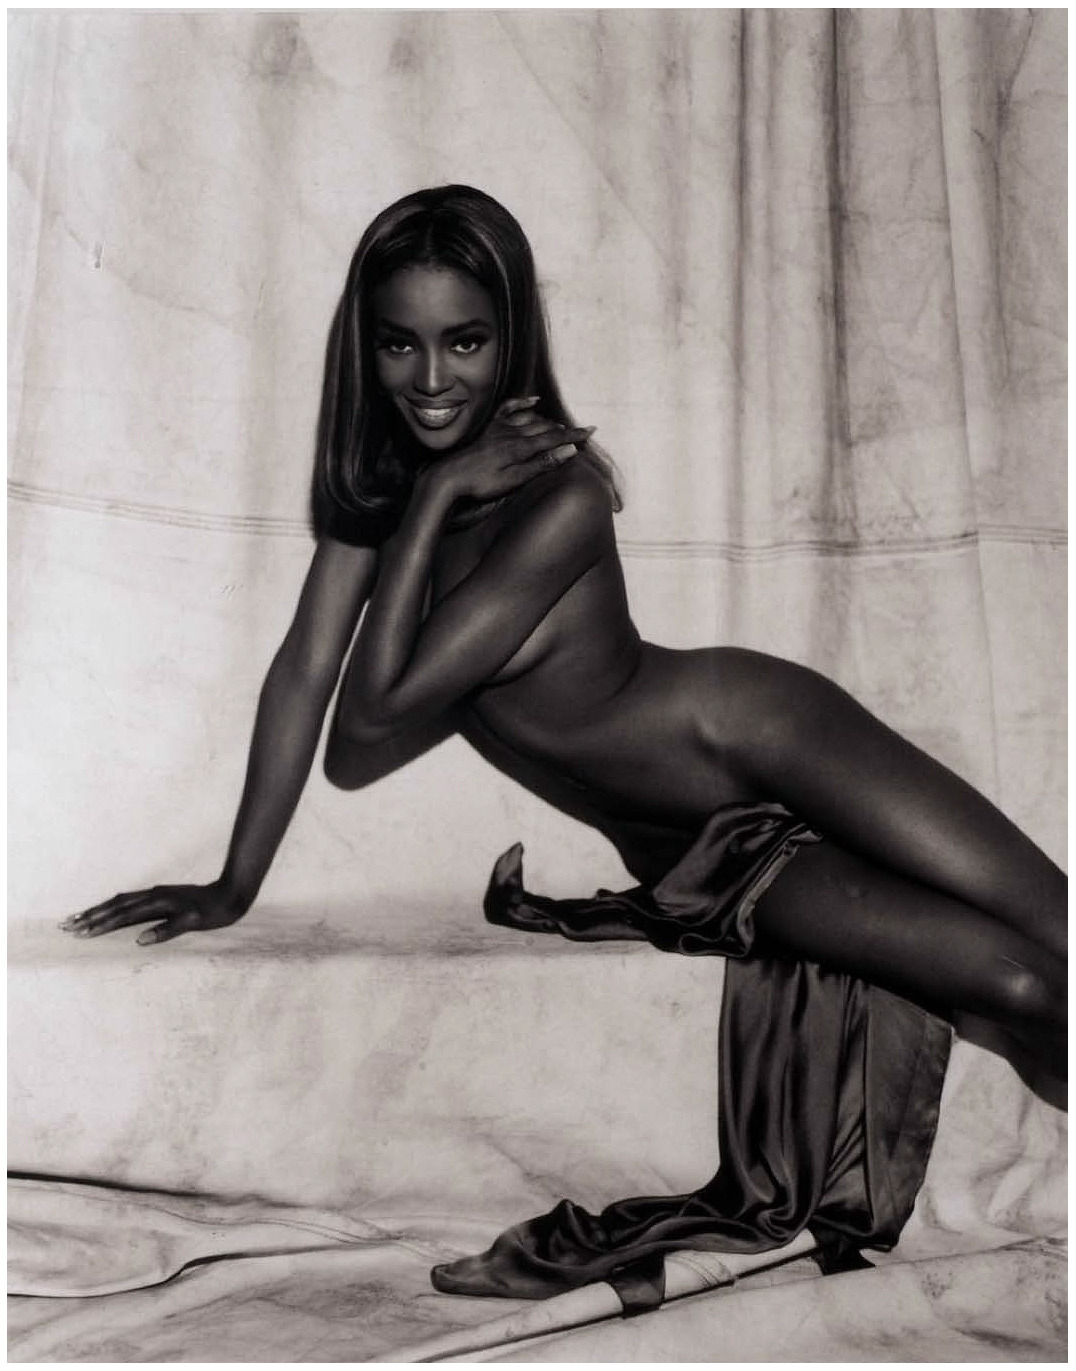 Naomi Campbell x Sante D'Orazio